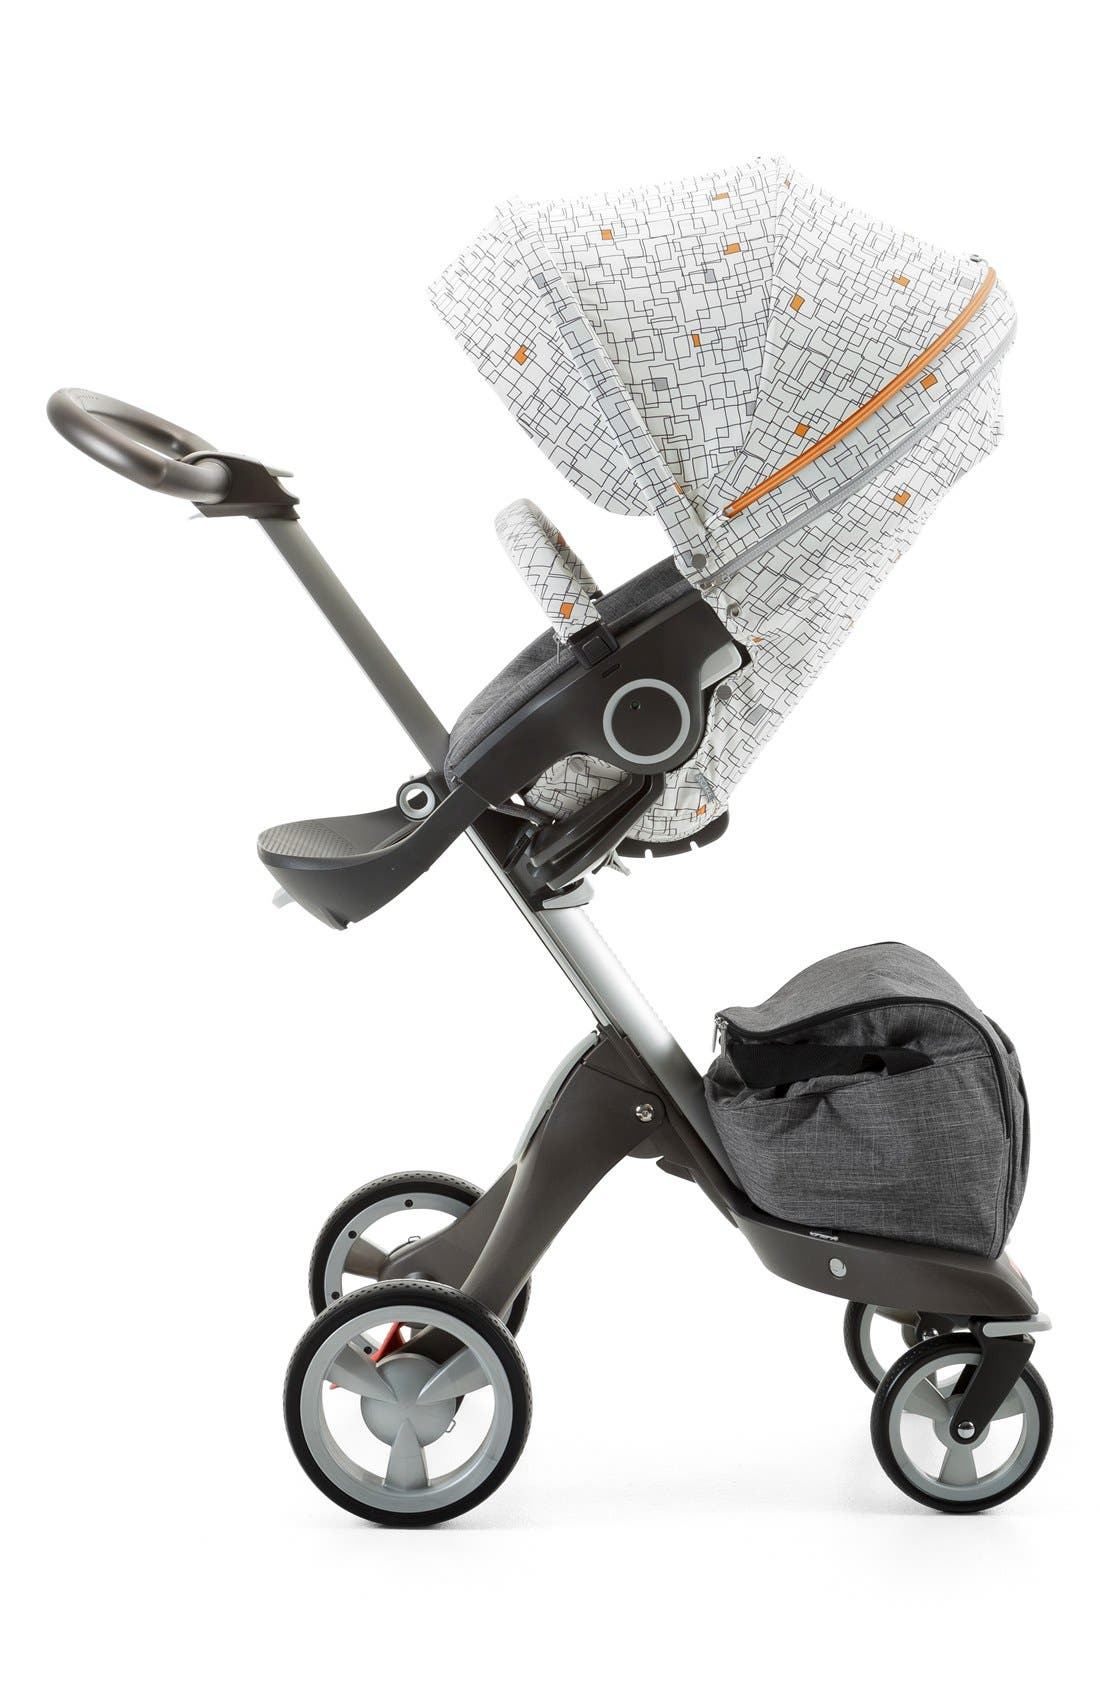 Main Image - Stokke 'Grid' Stroller Seat Style Kit